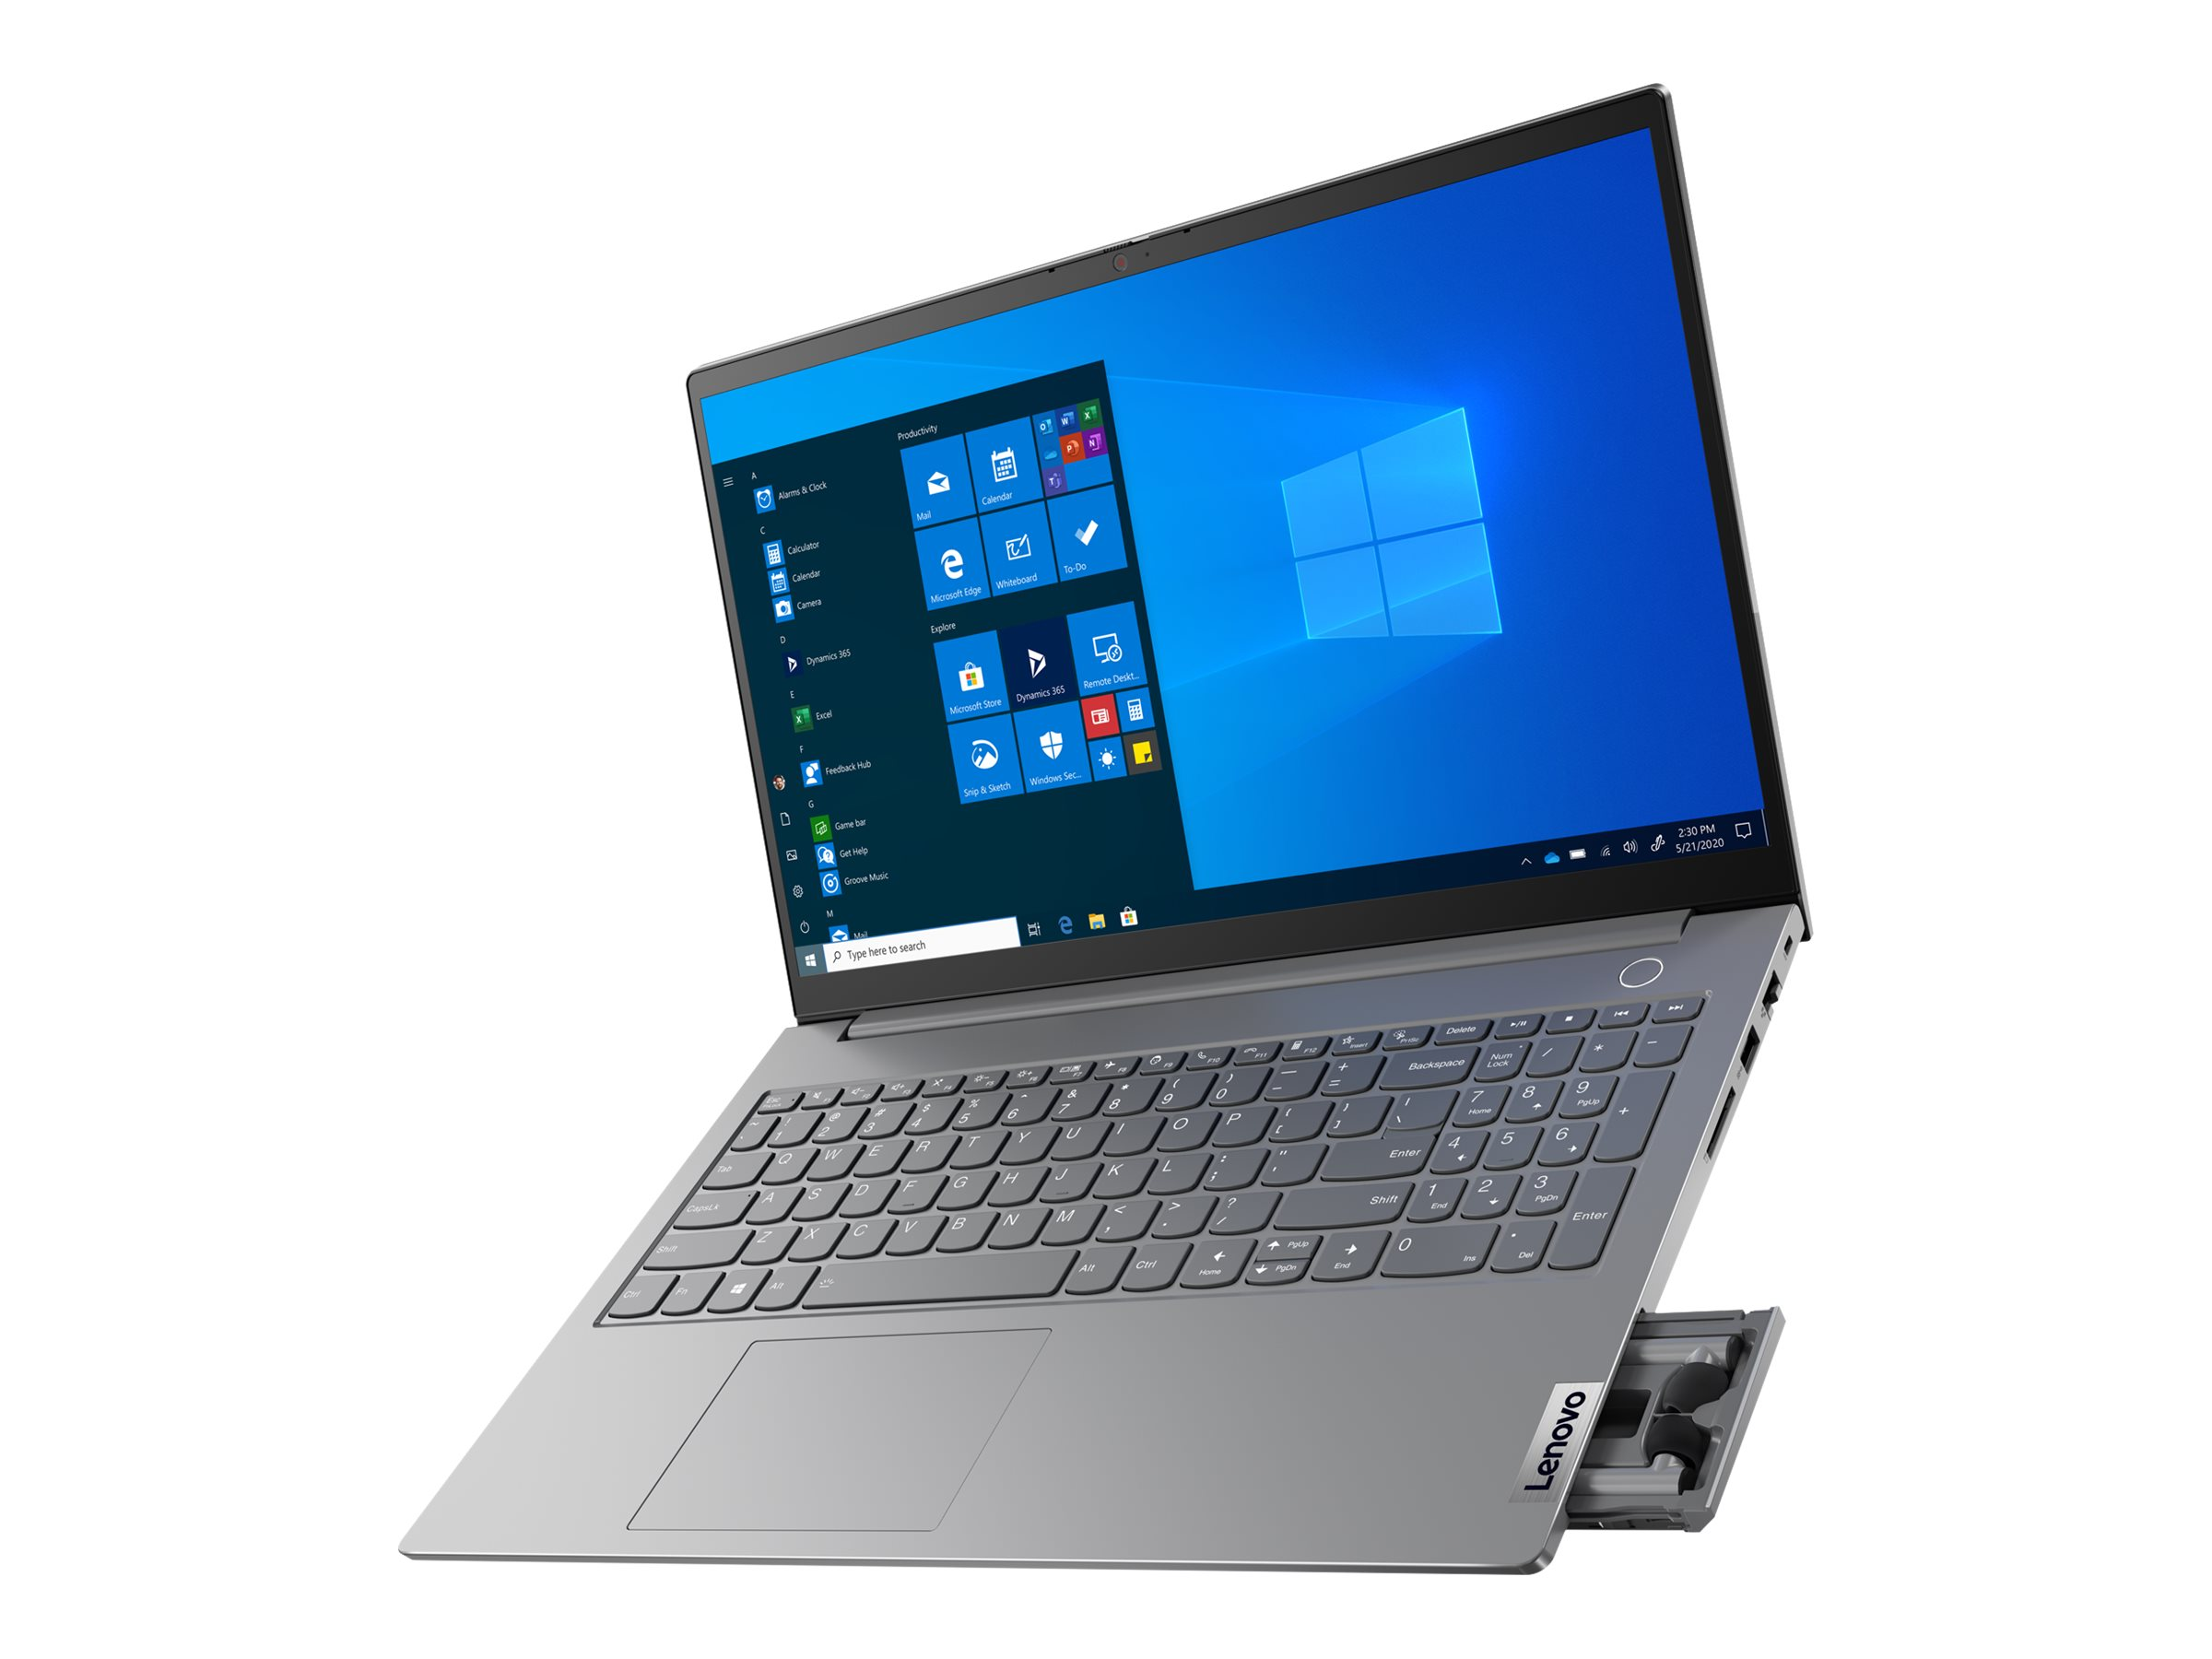 "Lenovo ThinkBook 13x ITG 20WJ - Core i7 1160G7 / 2.1 GHz - Evo - Win 10 Pro 64-Bit - 16 GB RAM - 512 GB SSD NVMe - 33.8 cm (13.3"")"